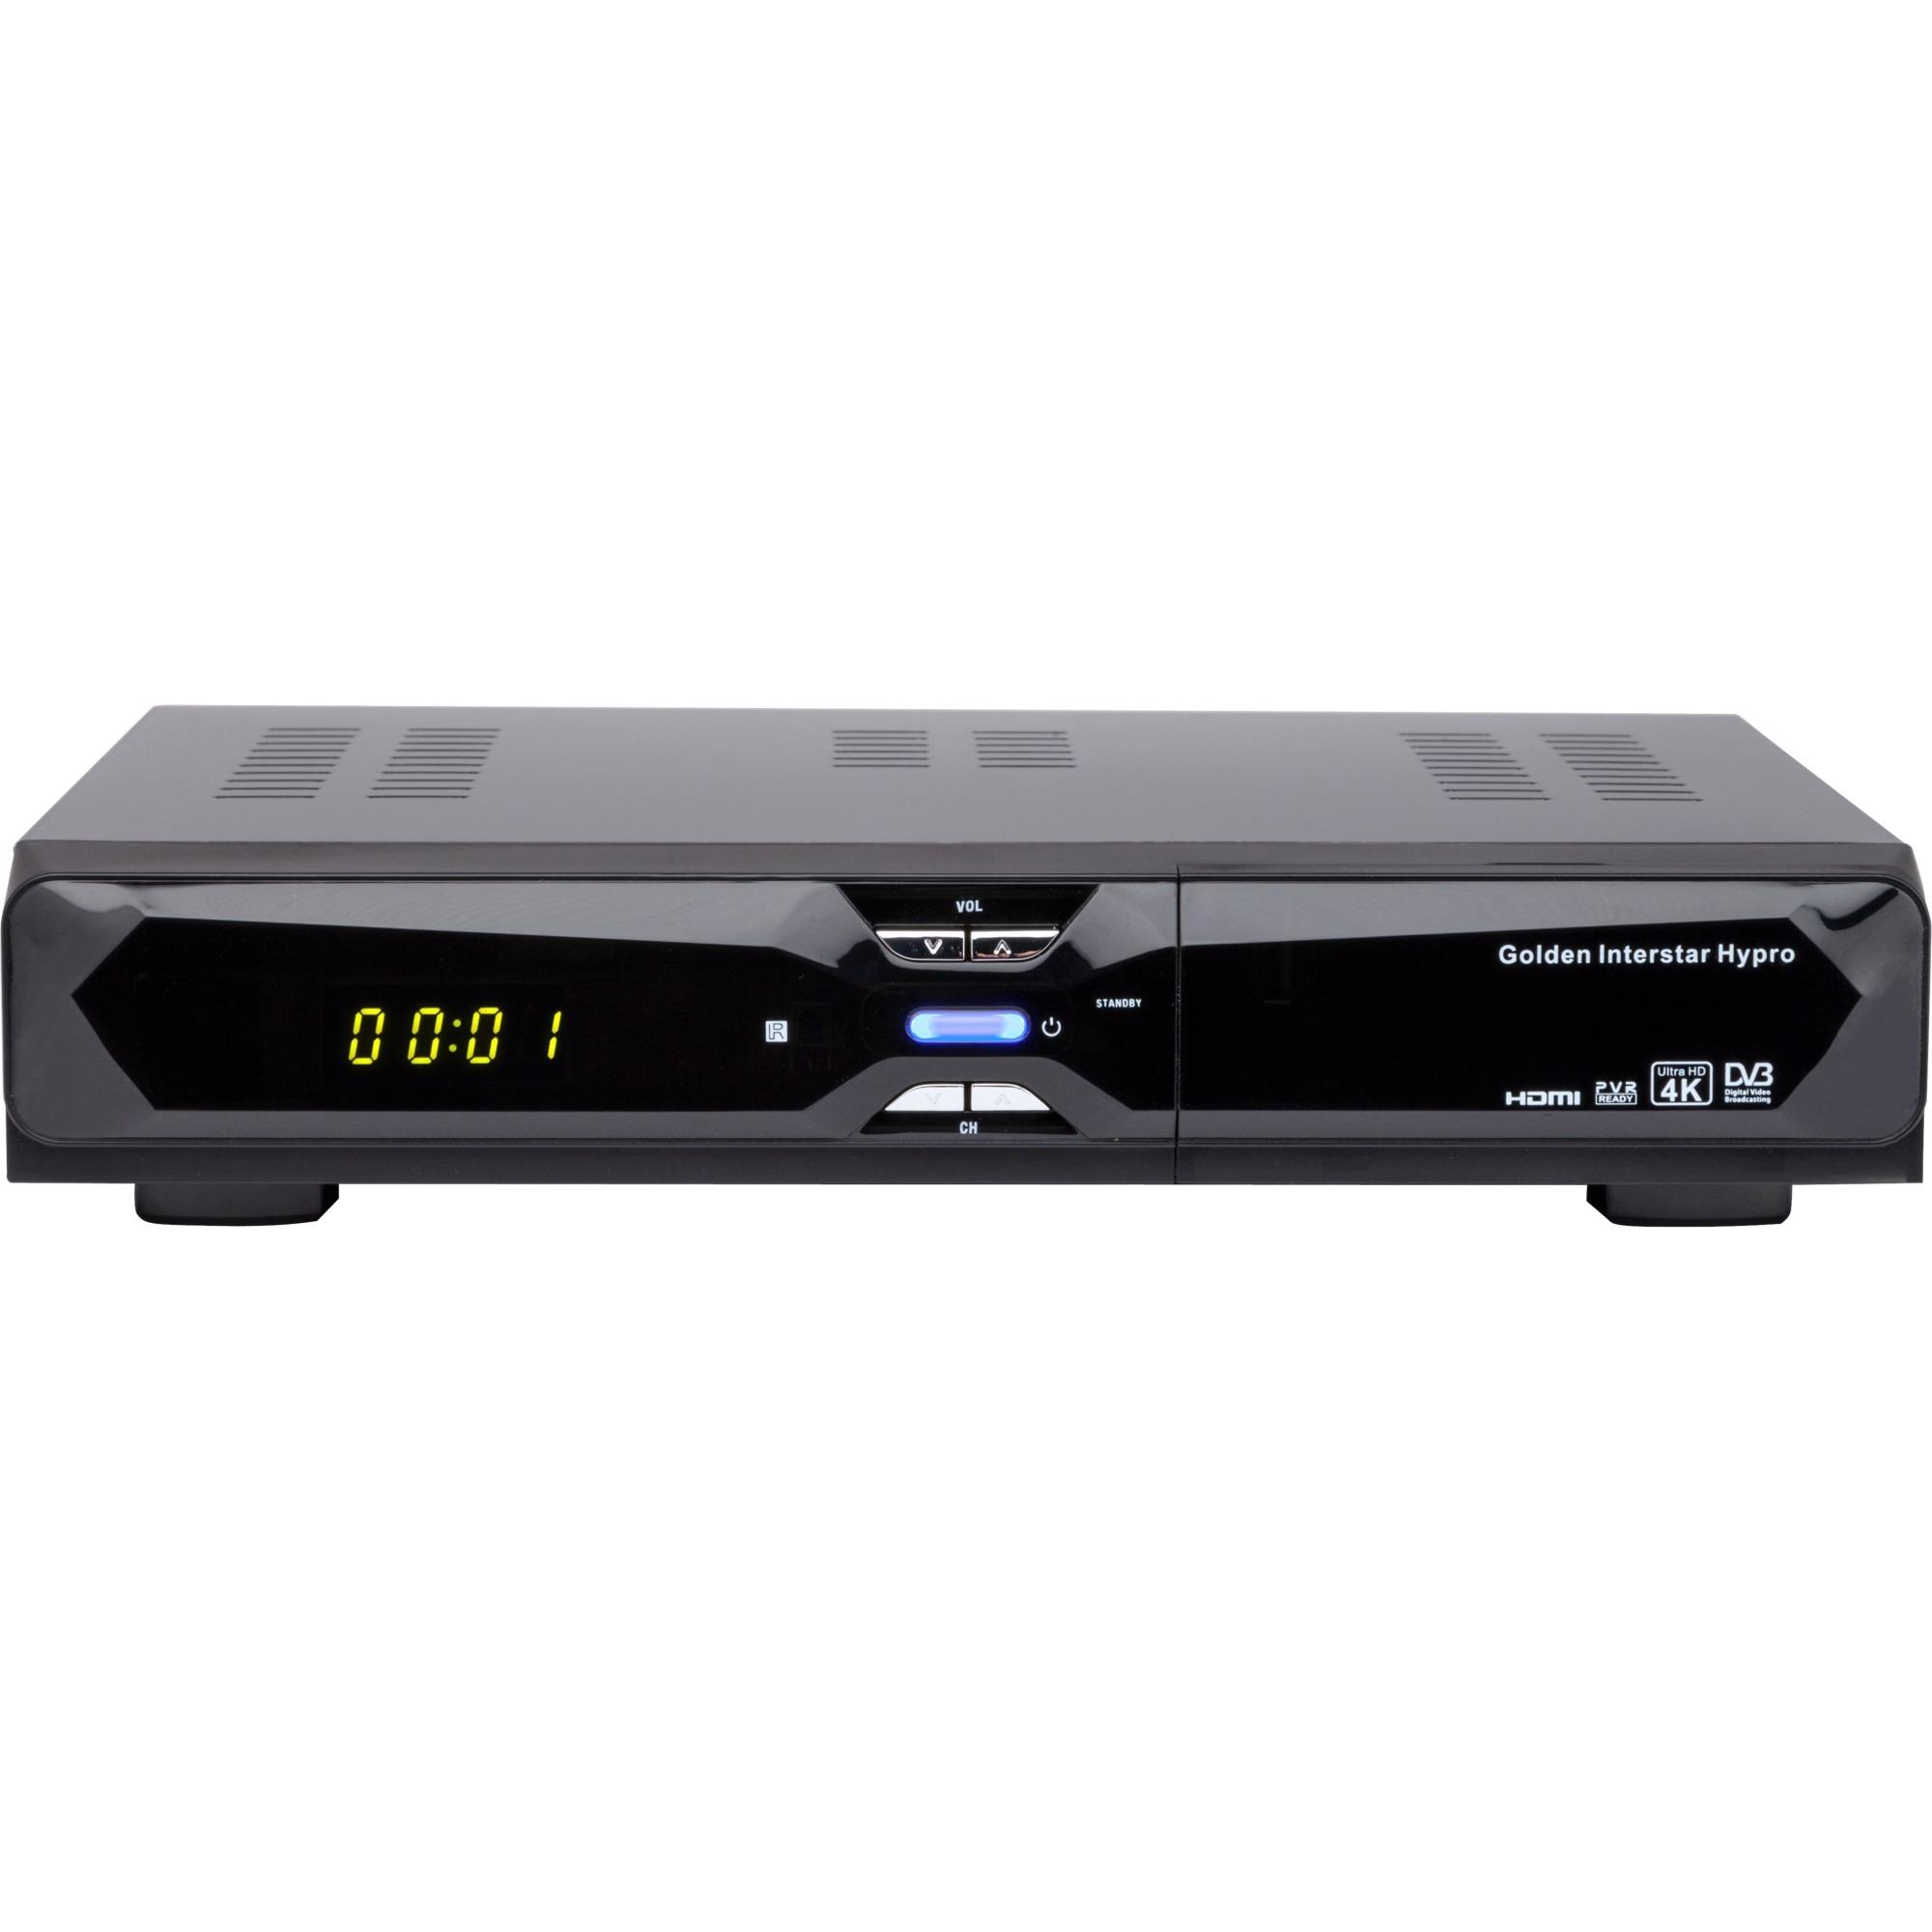 hypro-sort-av-receiver-sat-kabel-terr-receiver